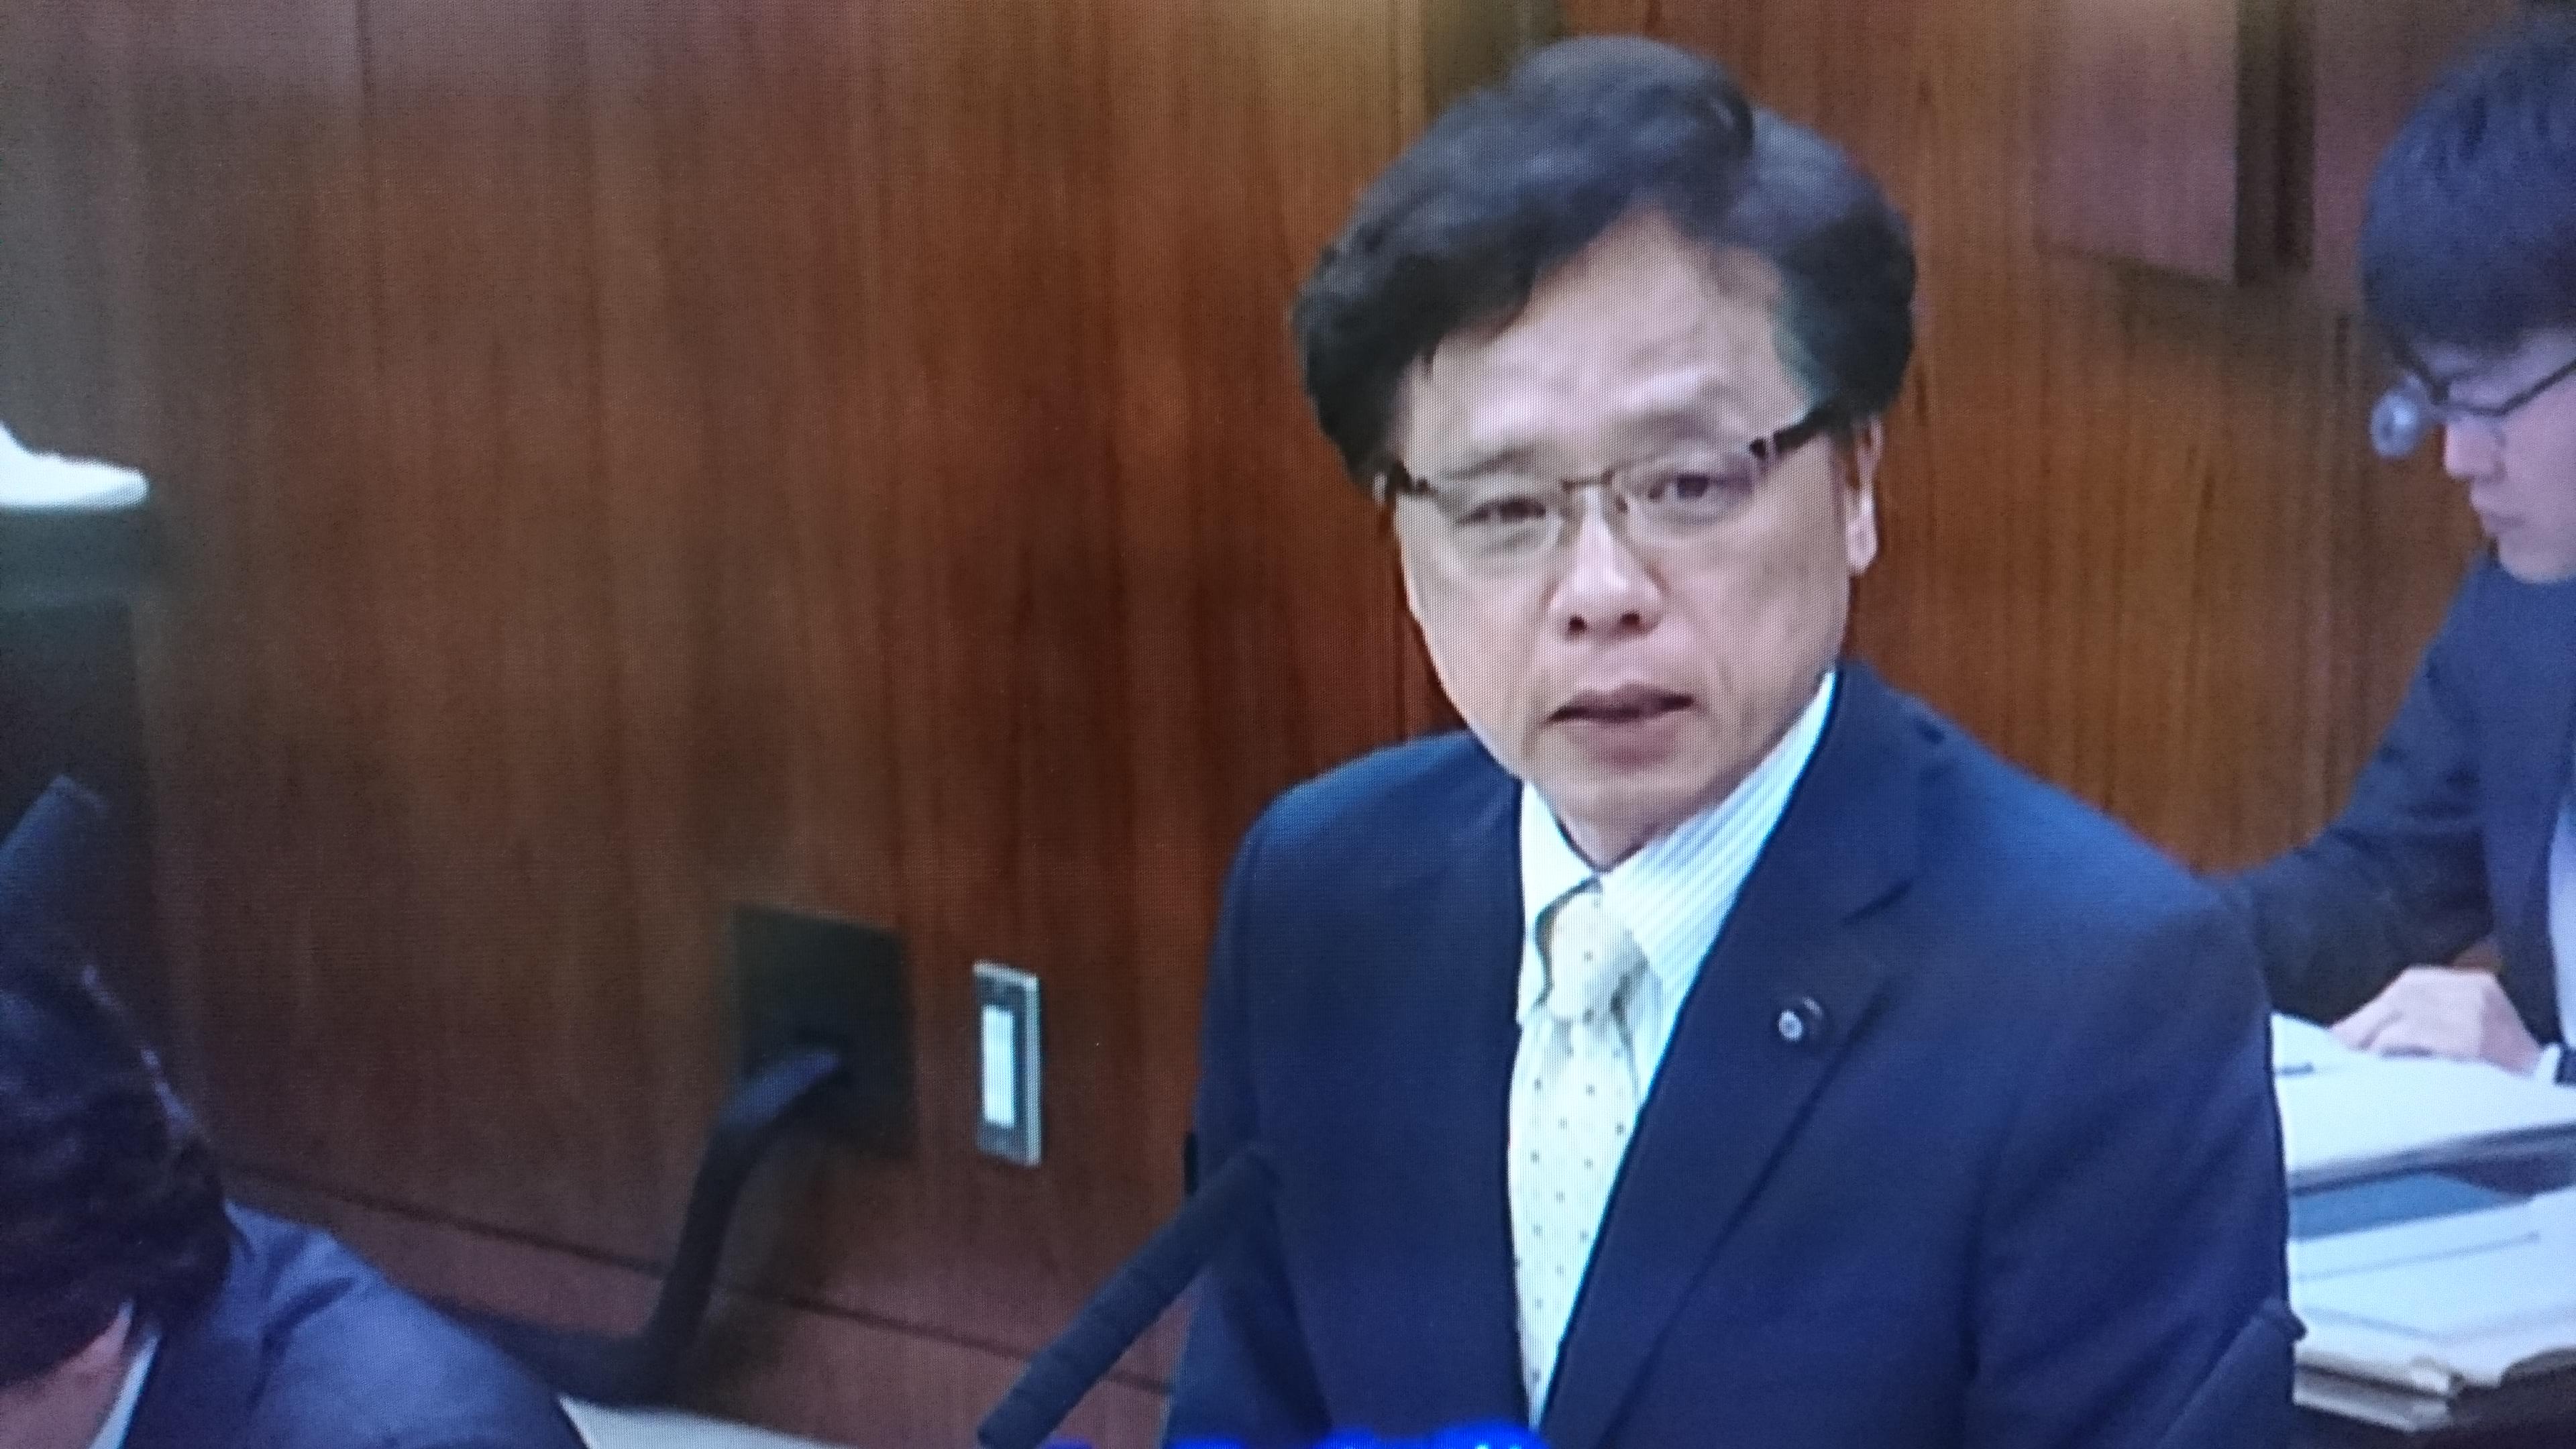 http://www.inoue-satoshi.com/diary/DSC_0290%5B1%5D.JPG